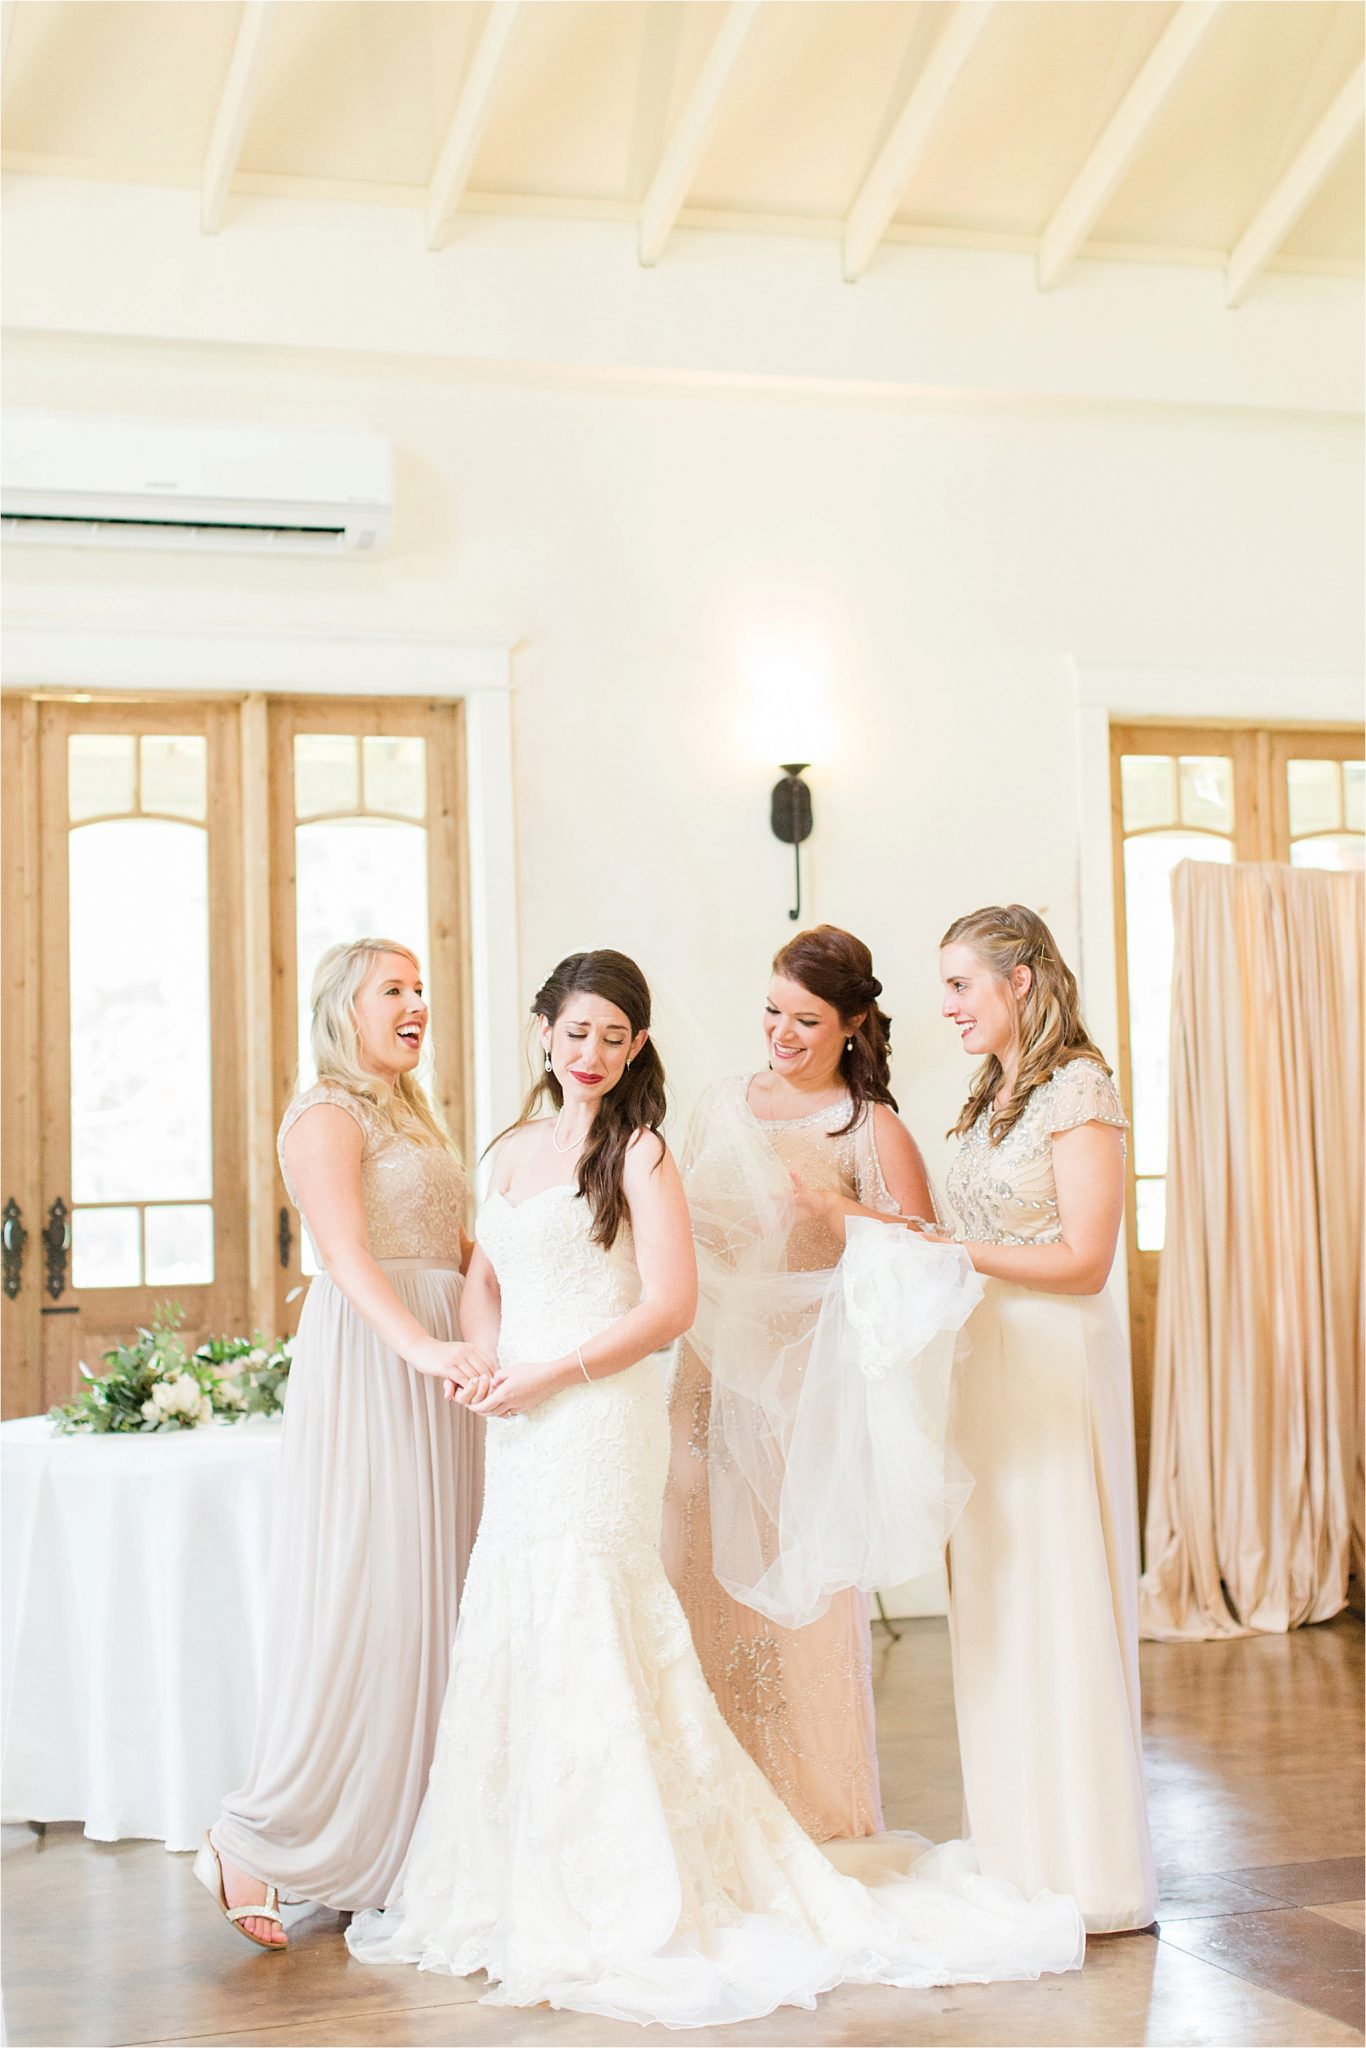 Bridesmaids-neutrals-champagnes-dresses-bride-brooch-hair-piece